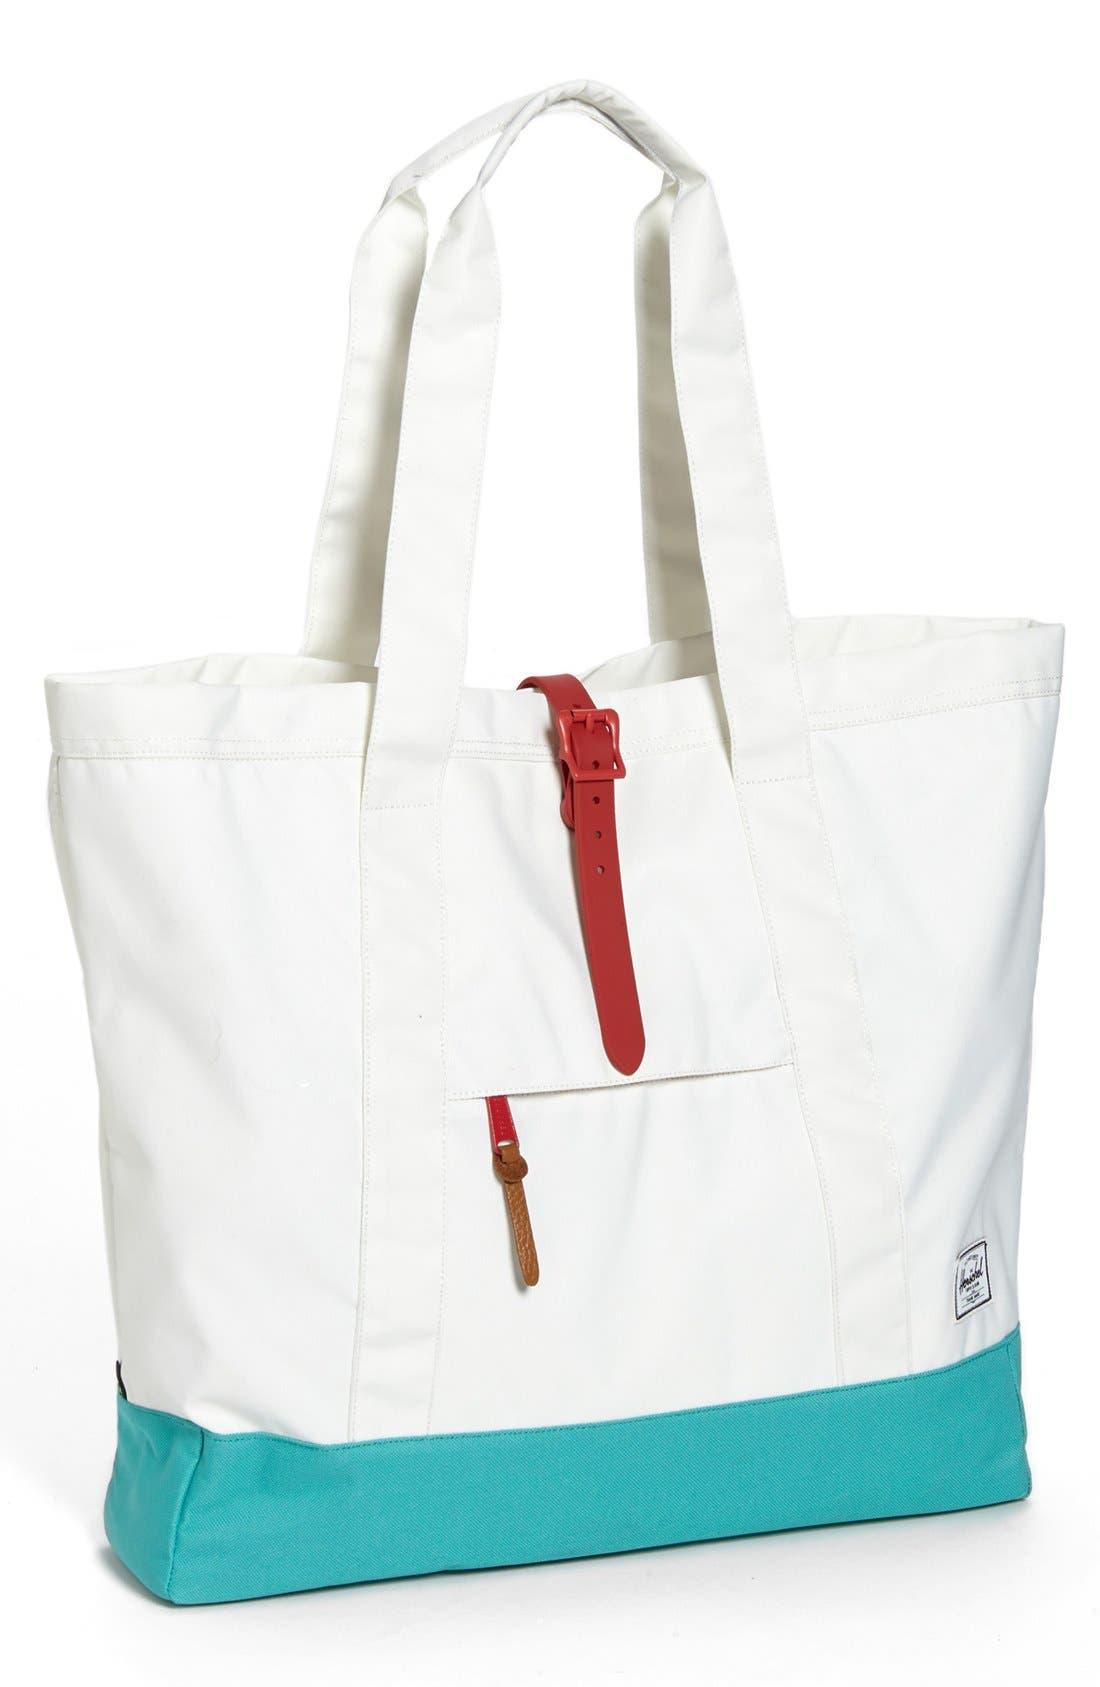 Alternate Image 1 Selected - Herschel Supply Co. 'Market - Studio Collection' Large Tote Bag